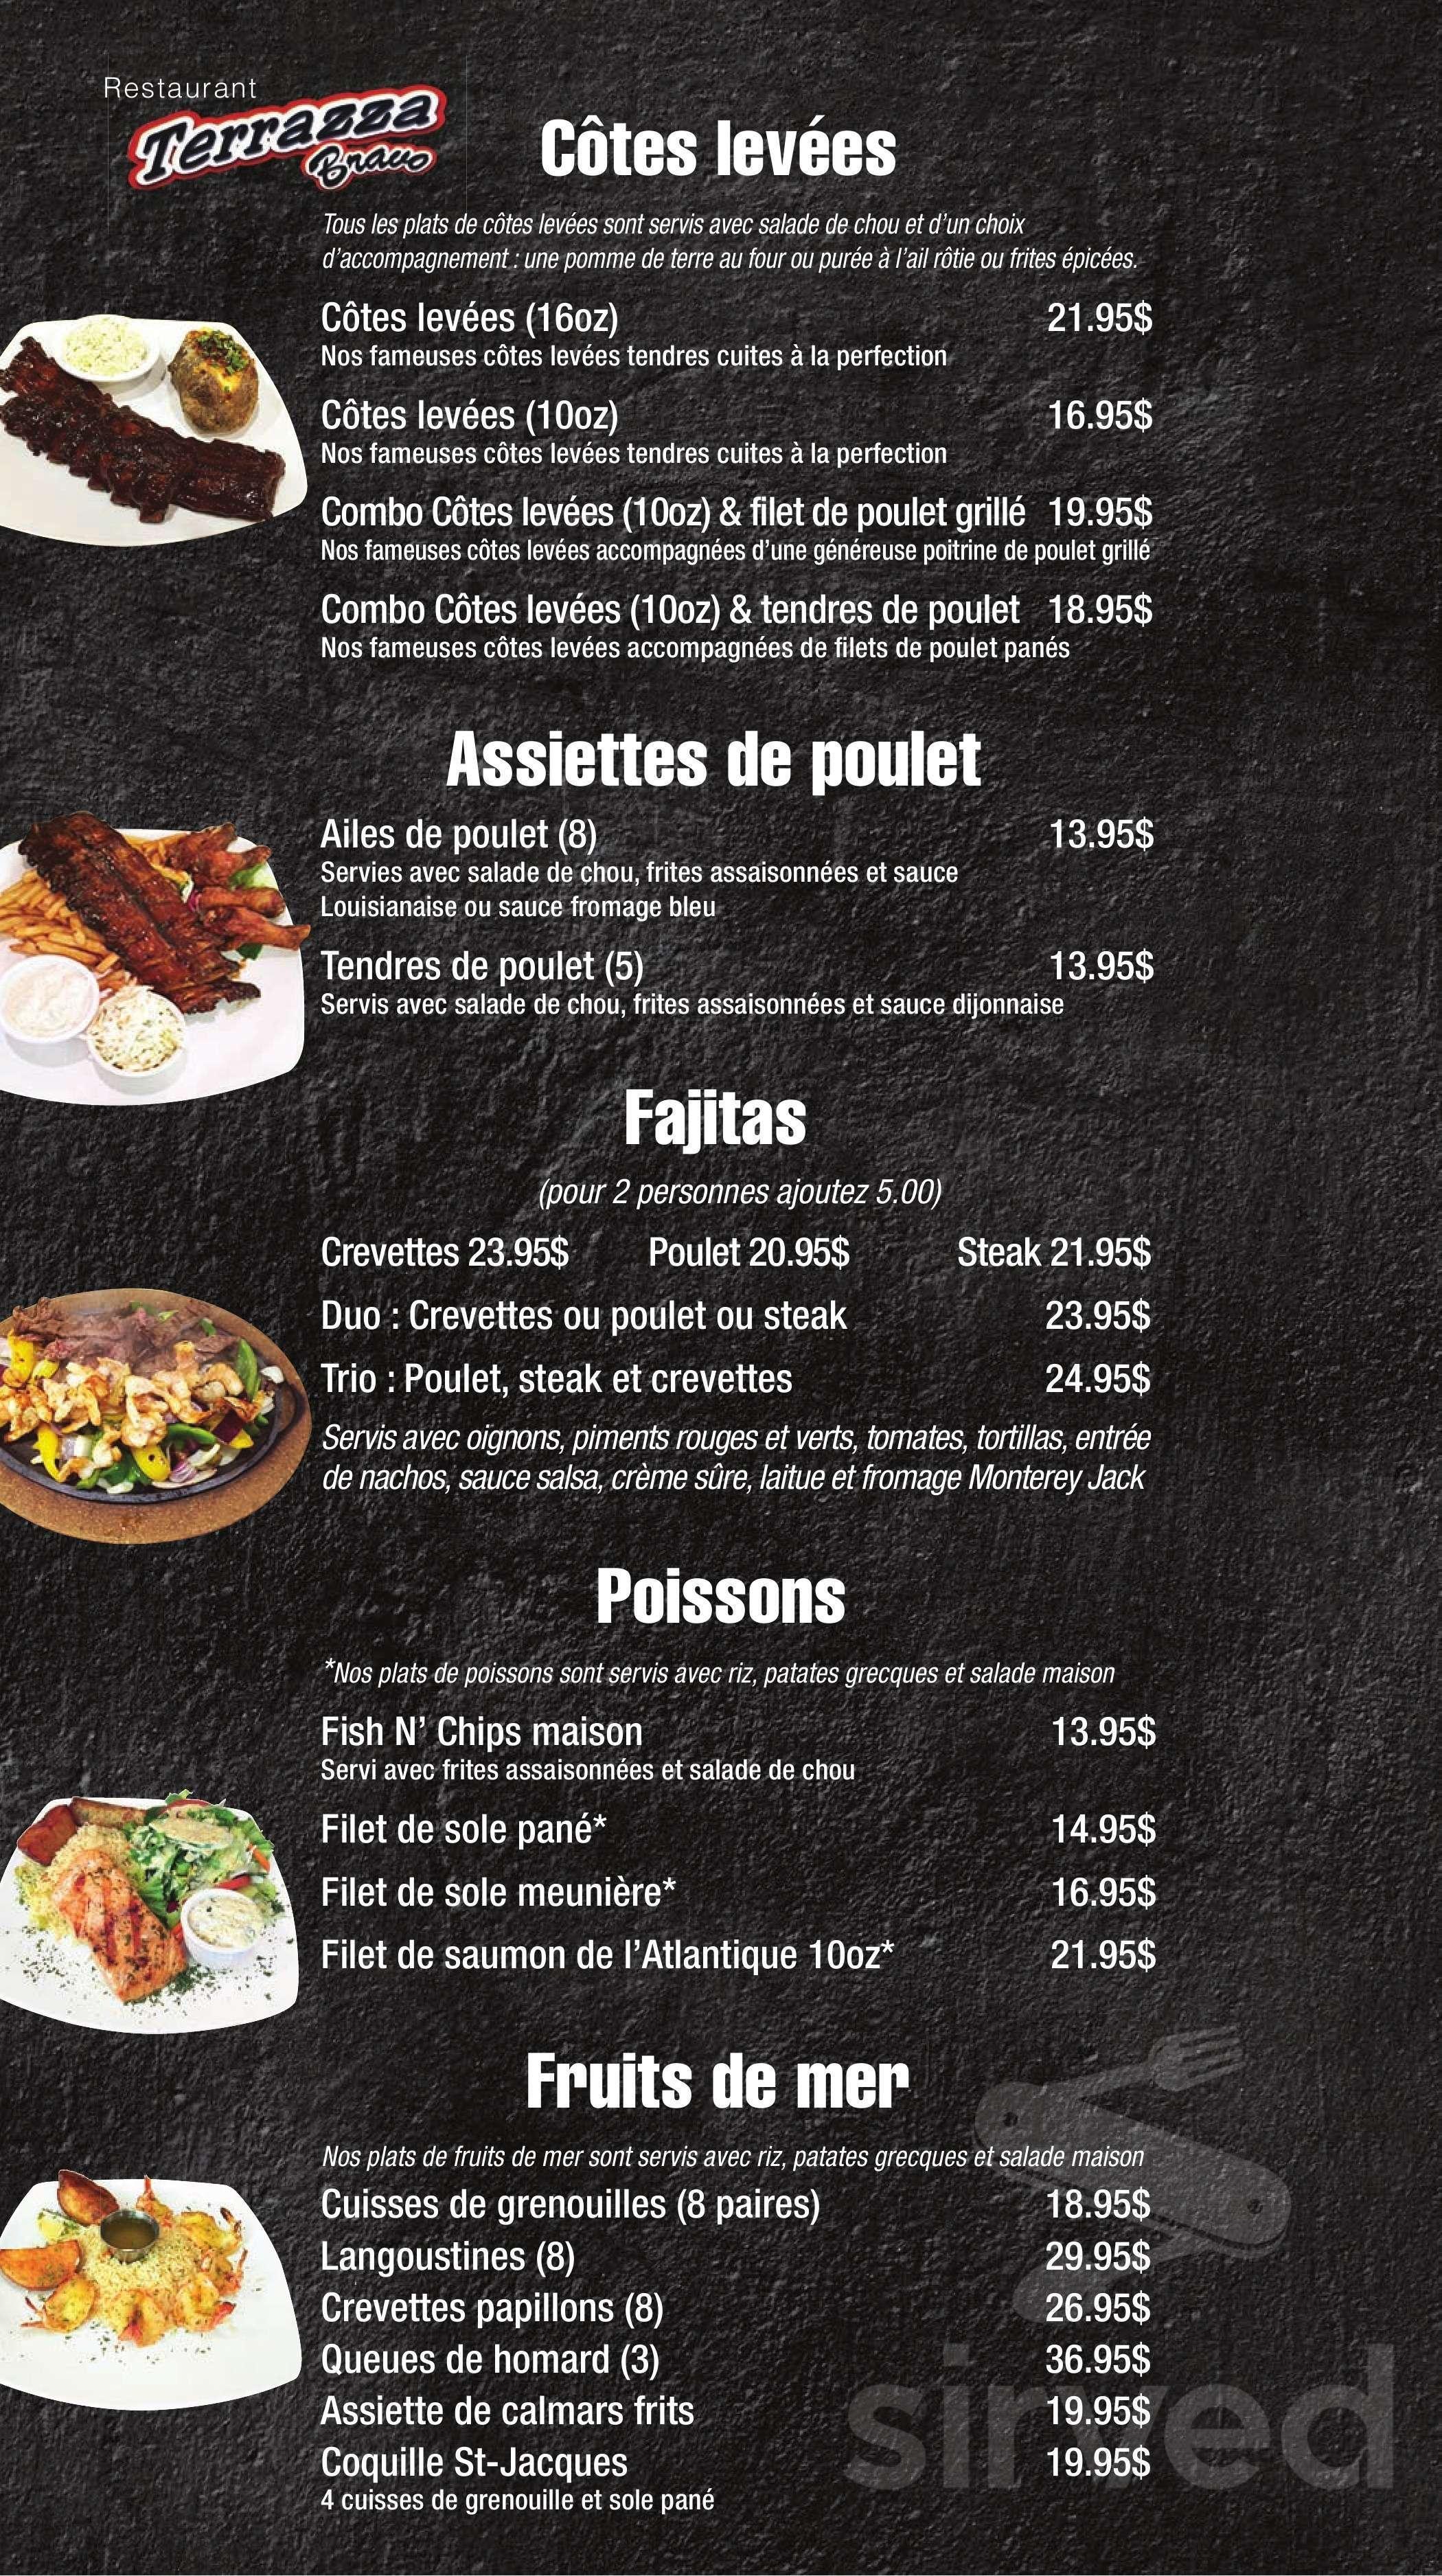 Restaurant Terrazza Bravo La Menu In Saint Charles